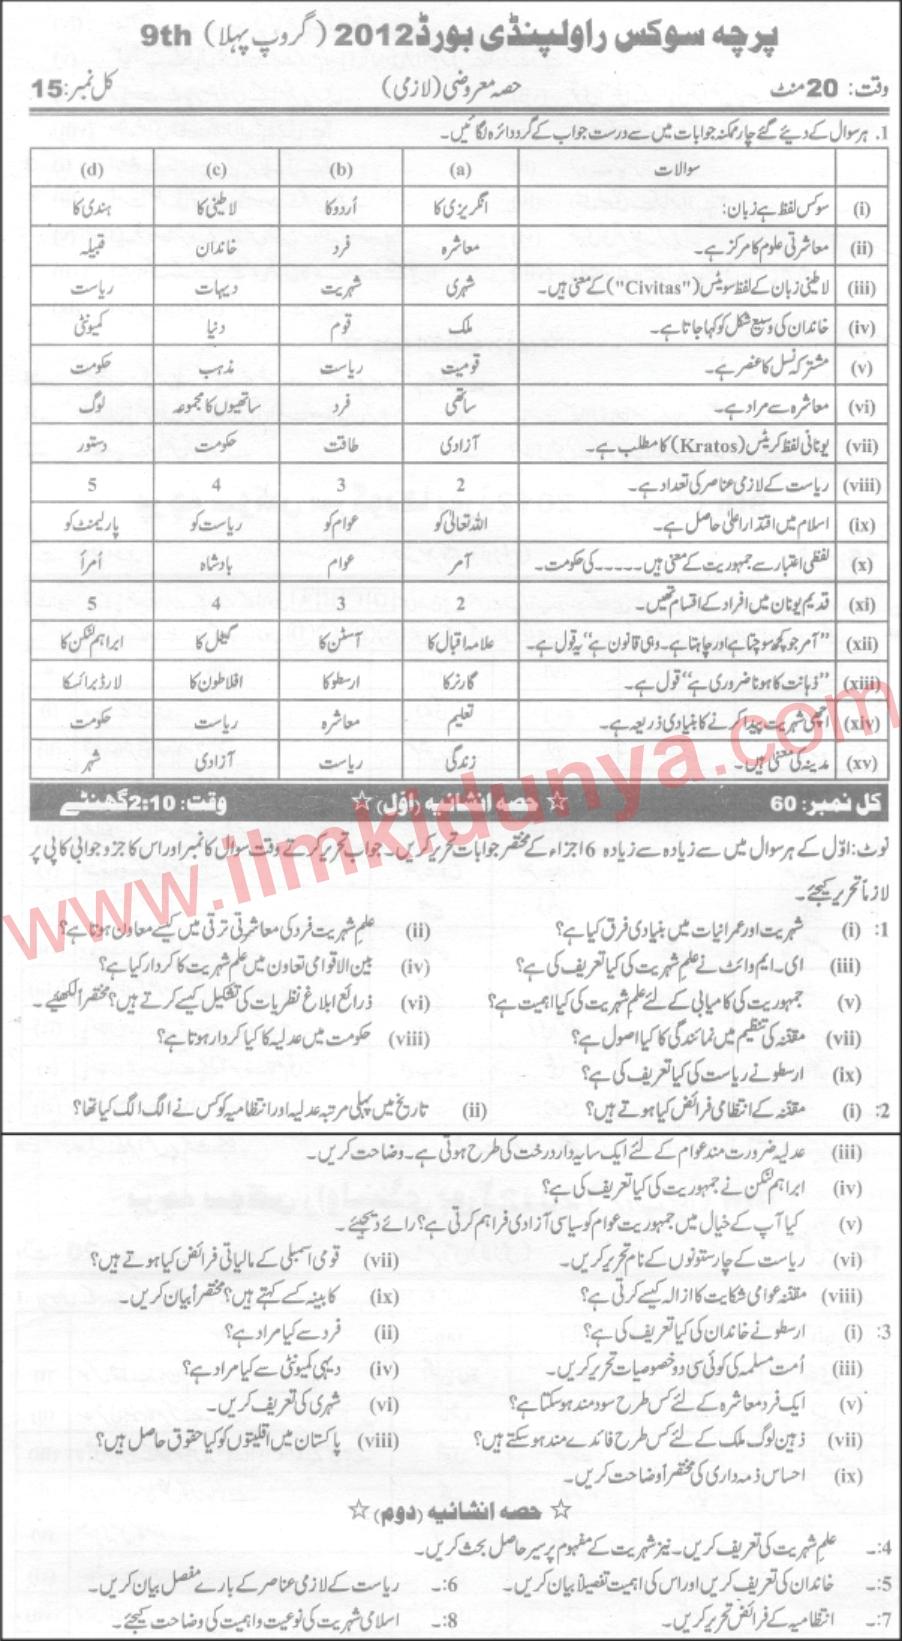 Rawalpindi Board Civics 9th Class Past Paper 2012 Group 1